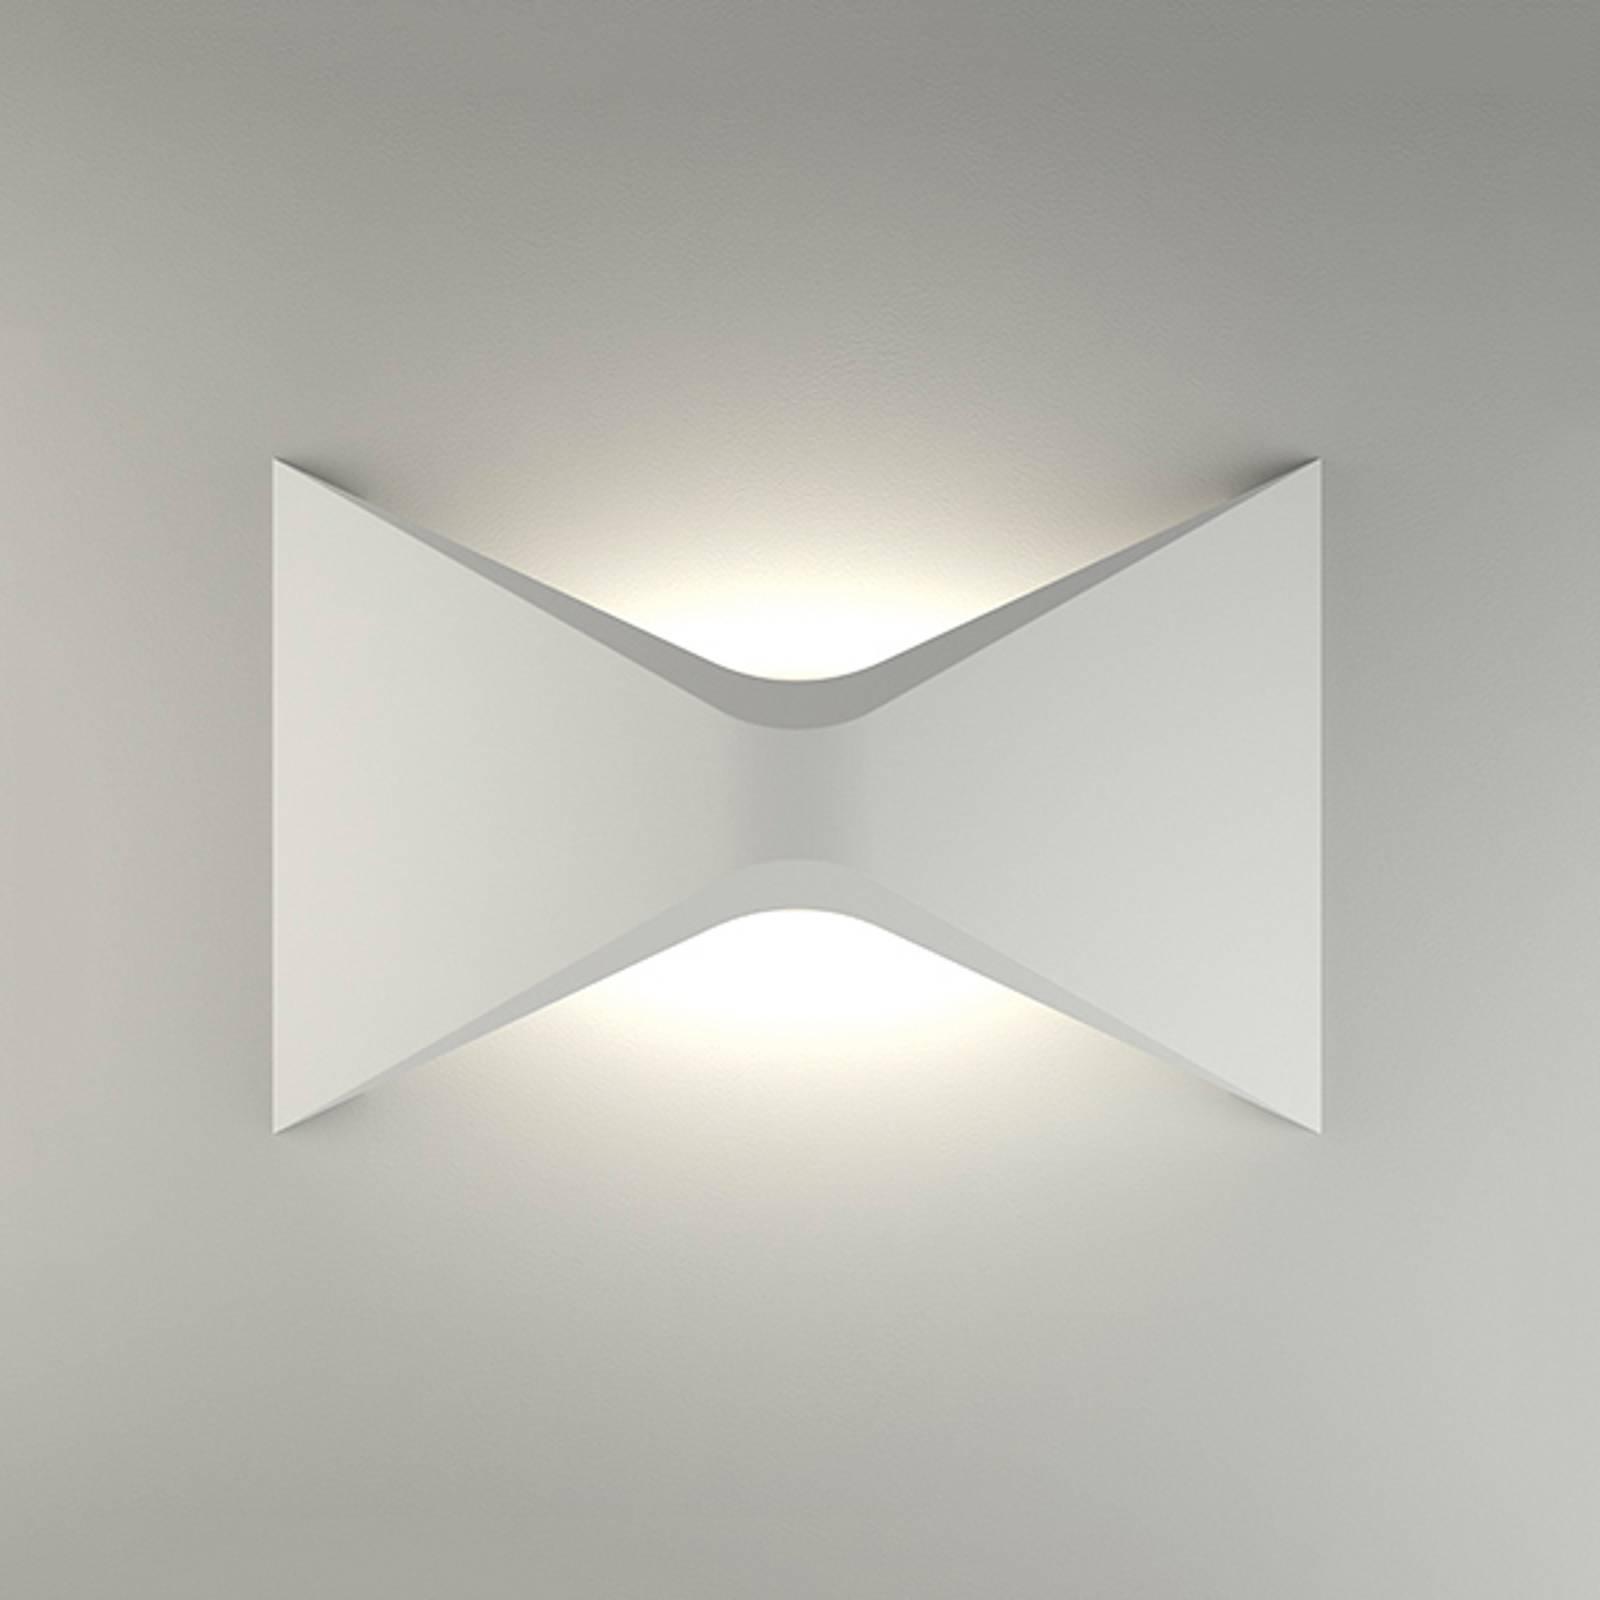 LED wandlamp 2388 keramiek 3.000 K niet dimbaar